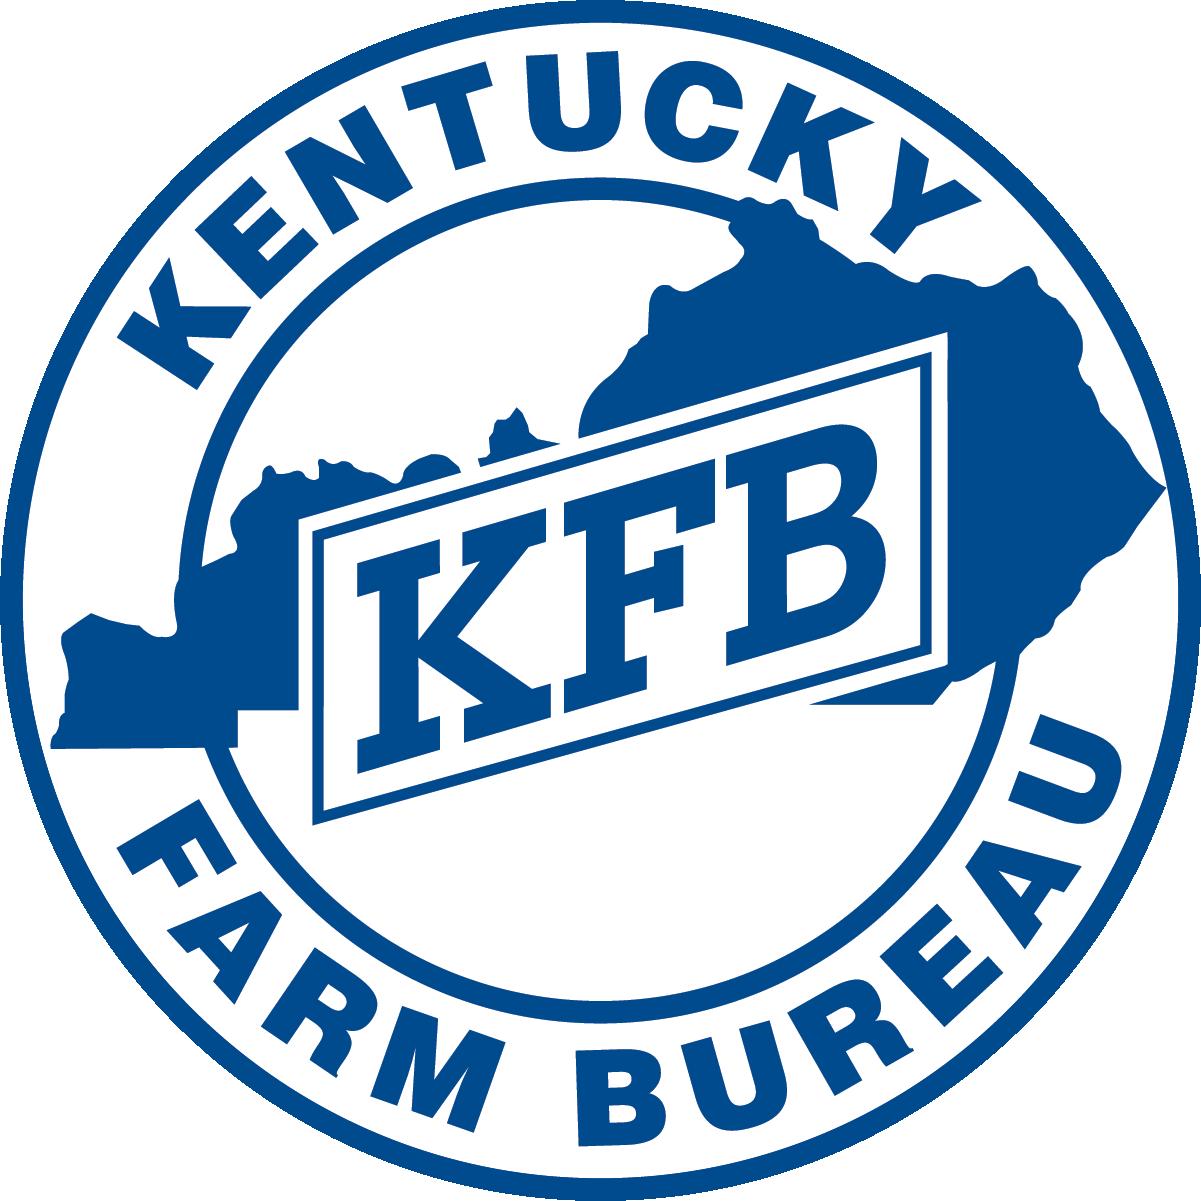 Kentucky Farm Bureau sponsor logo